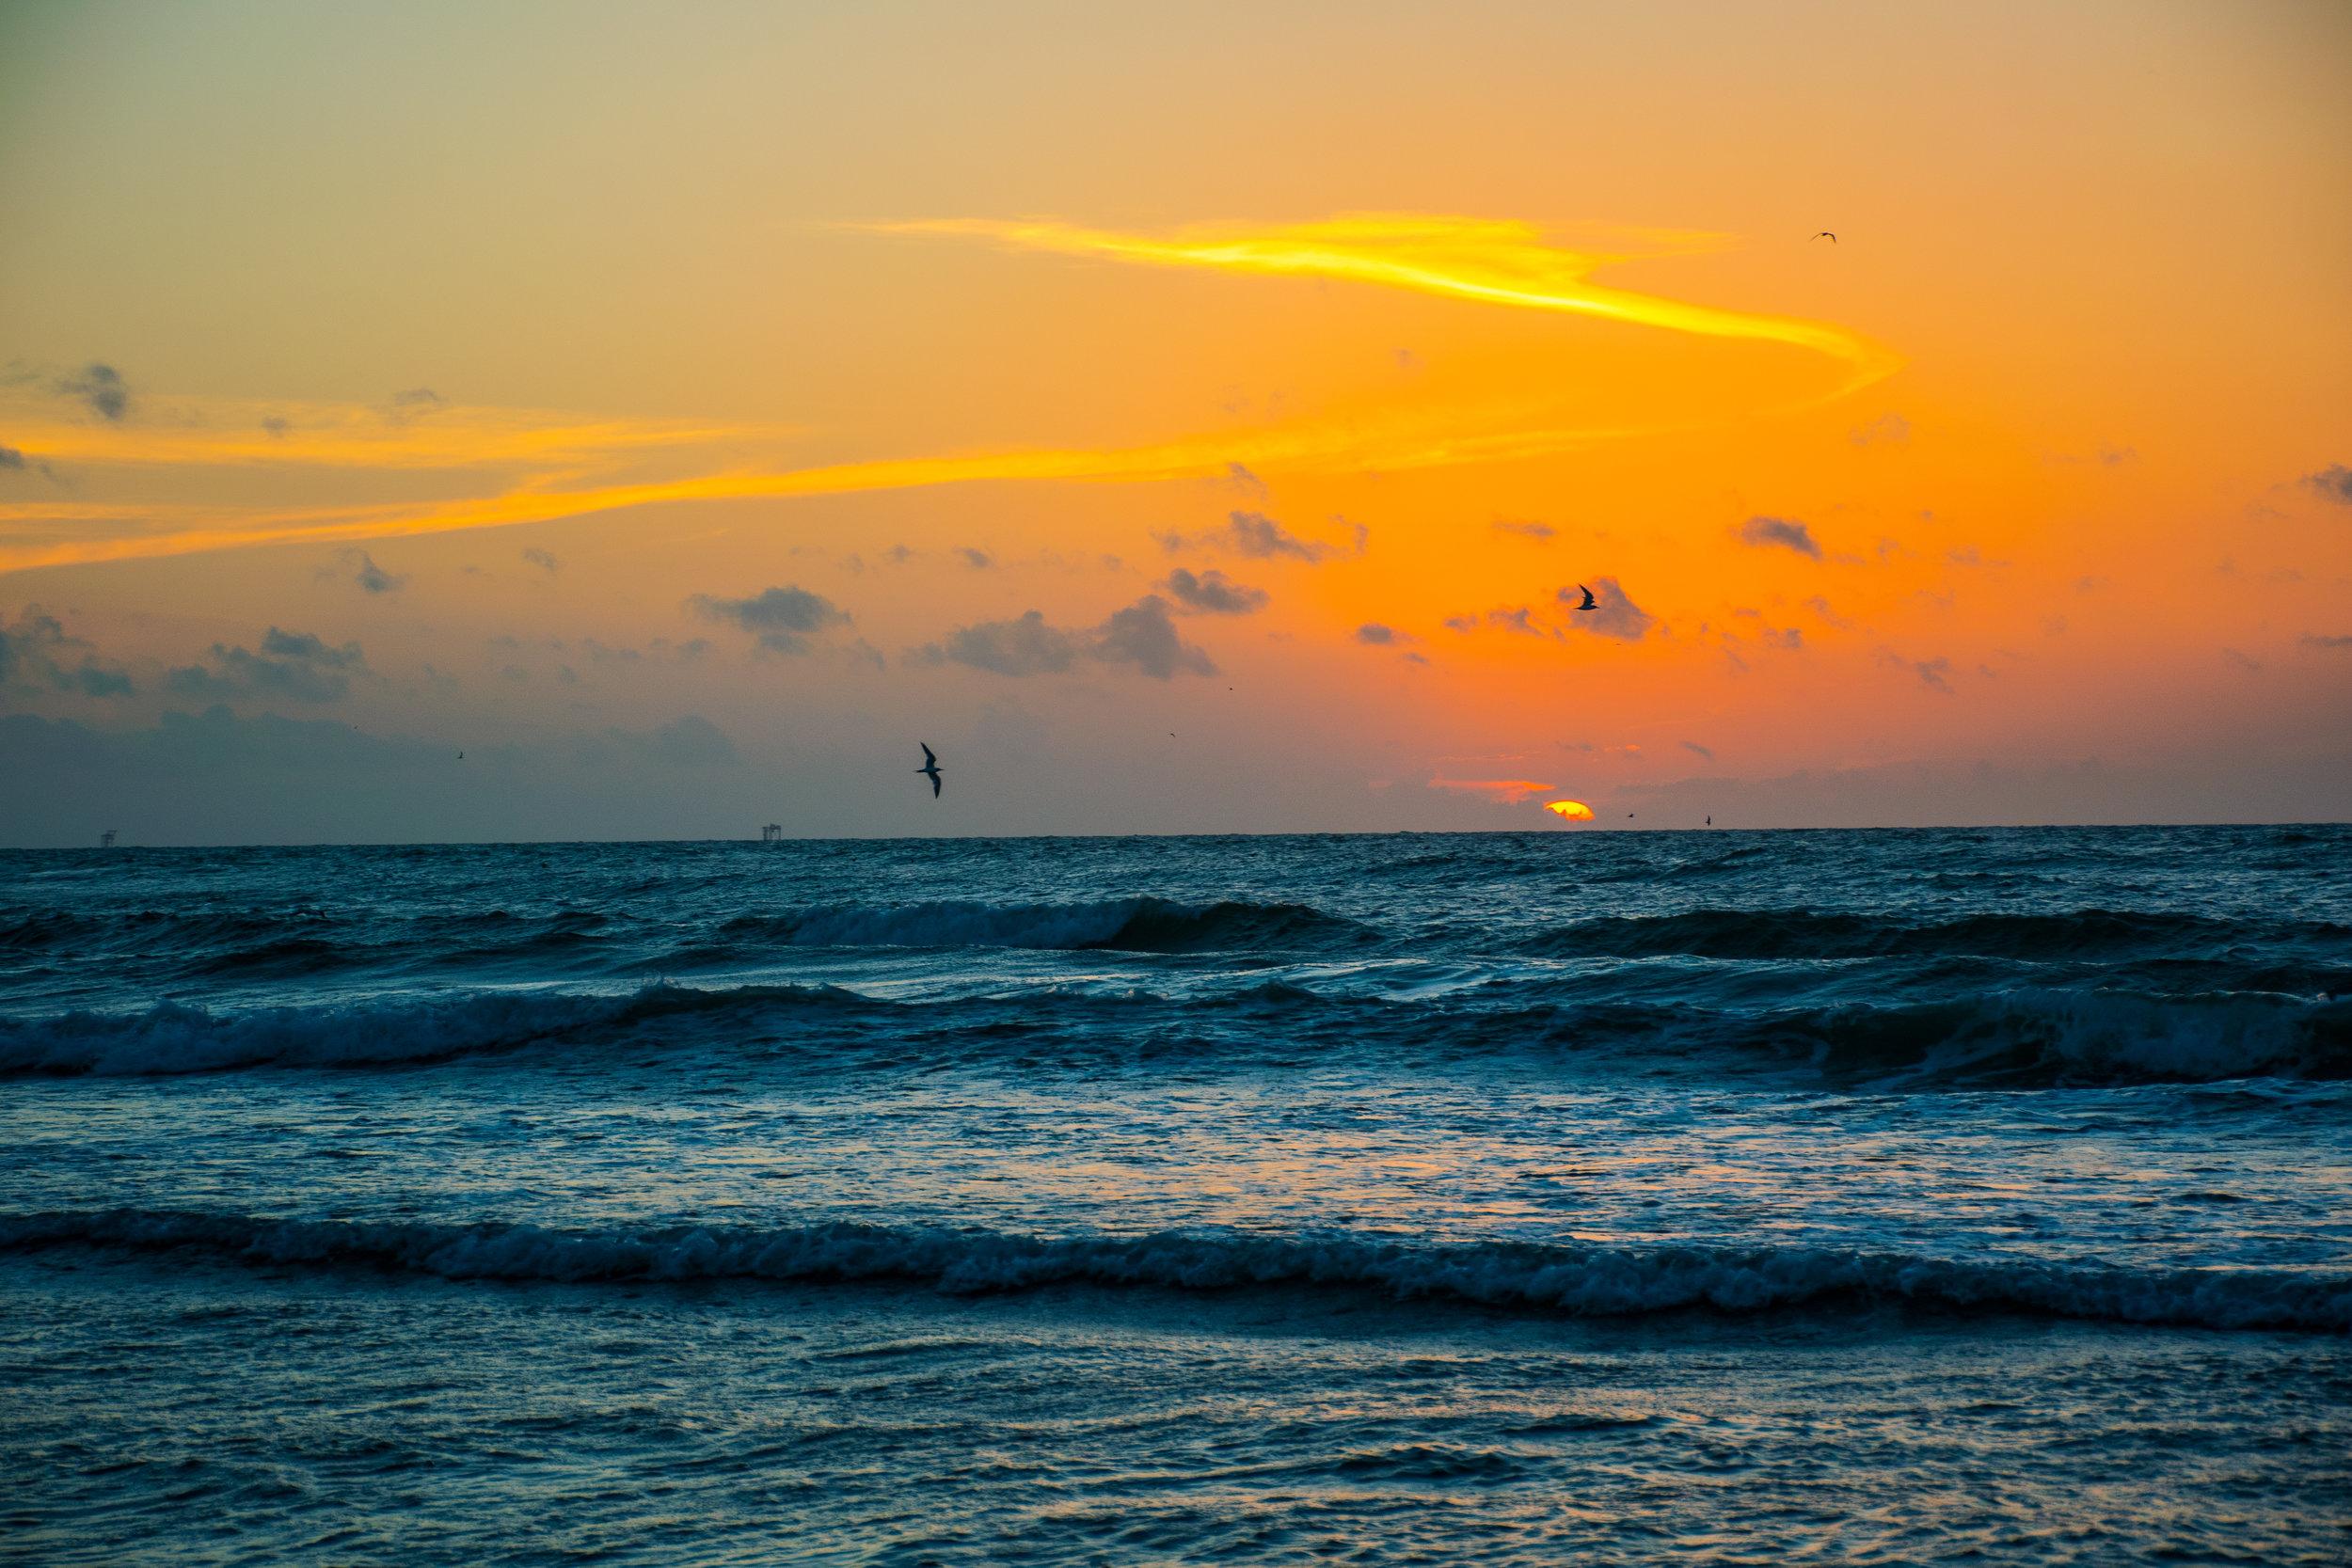 iStock-Sunrise Over Waves Crashing on Beach478831502.jpg